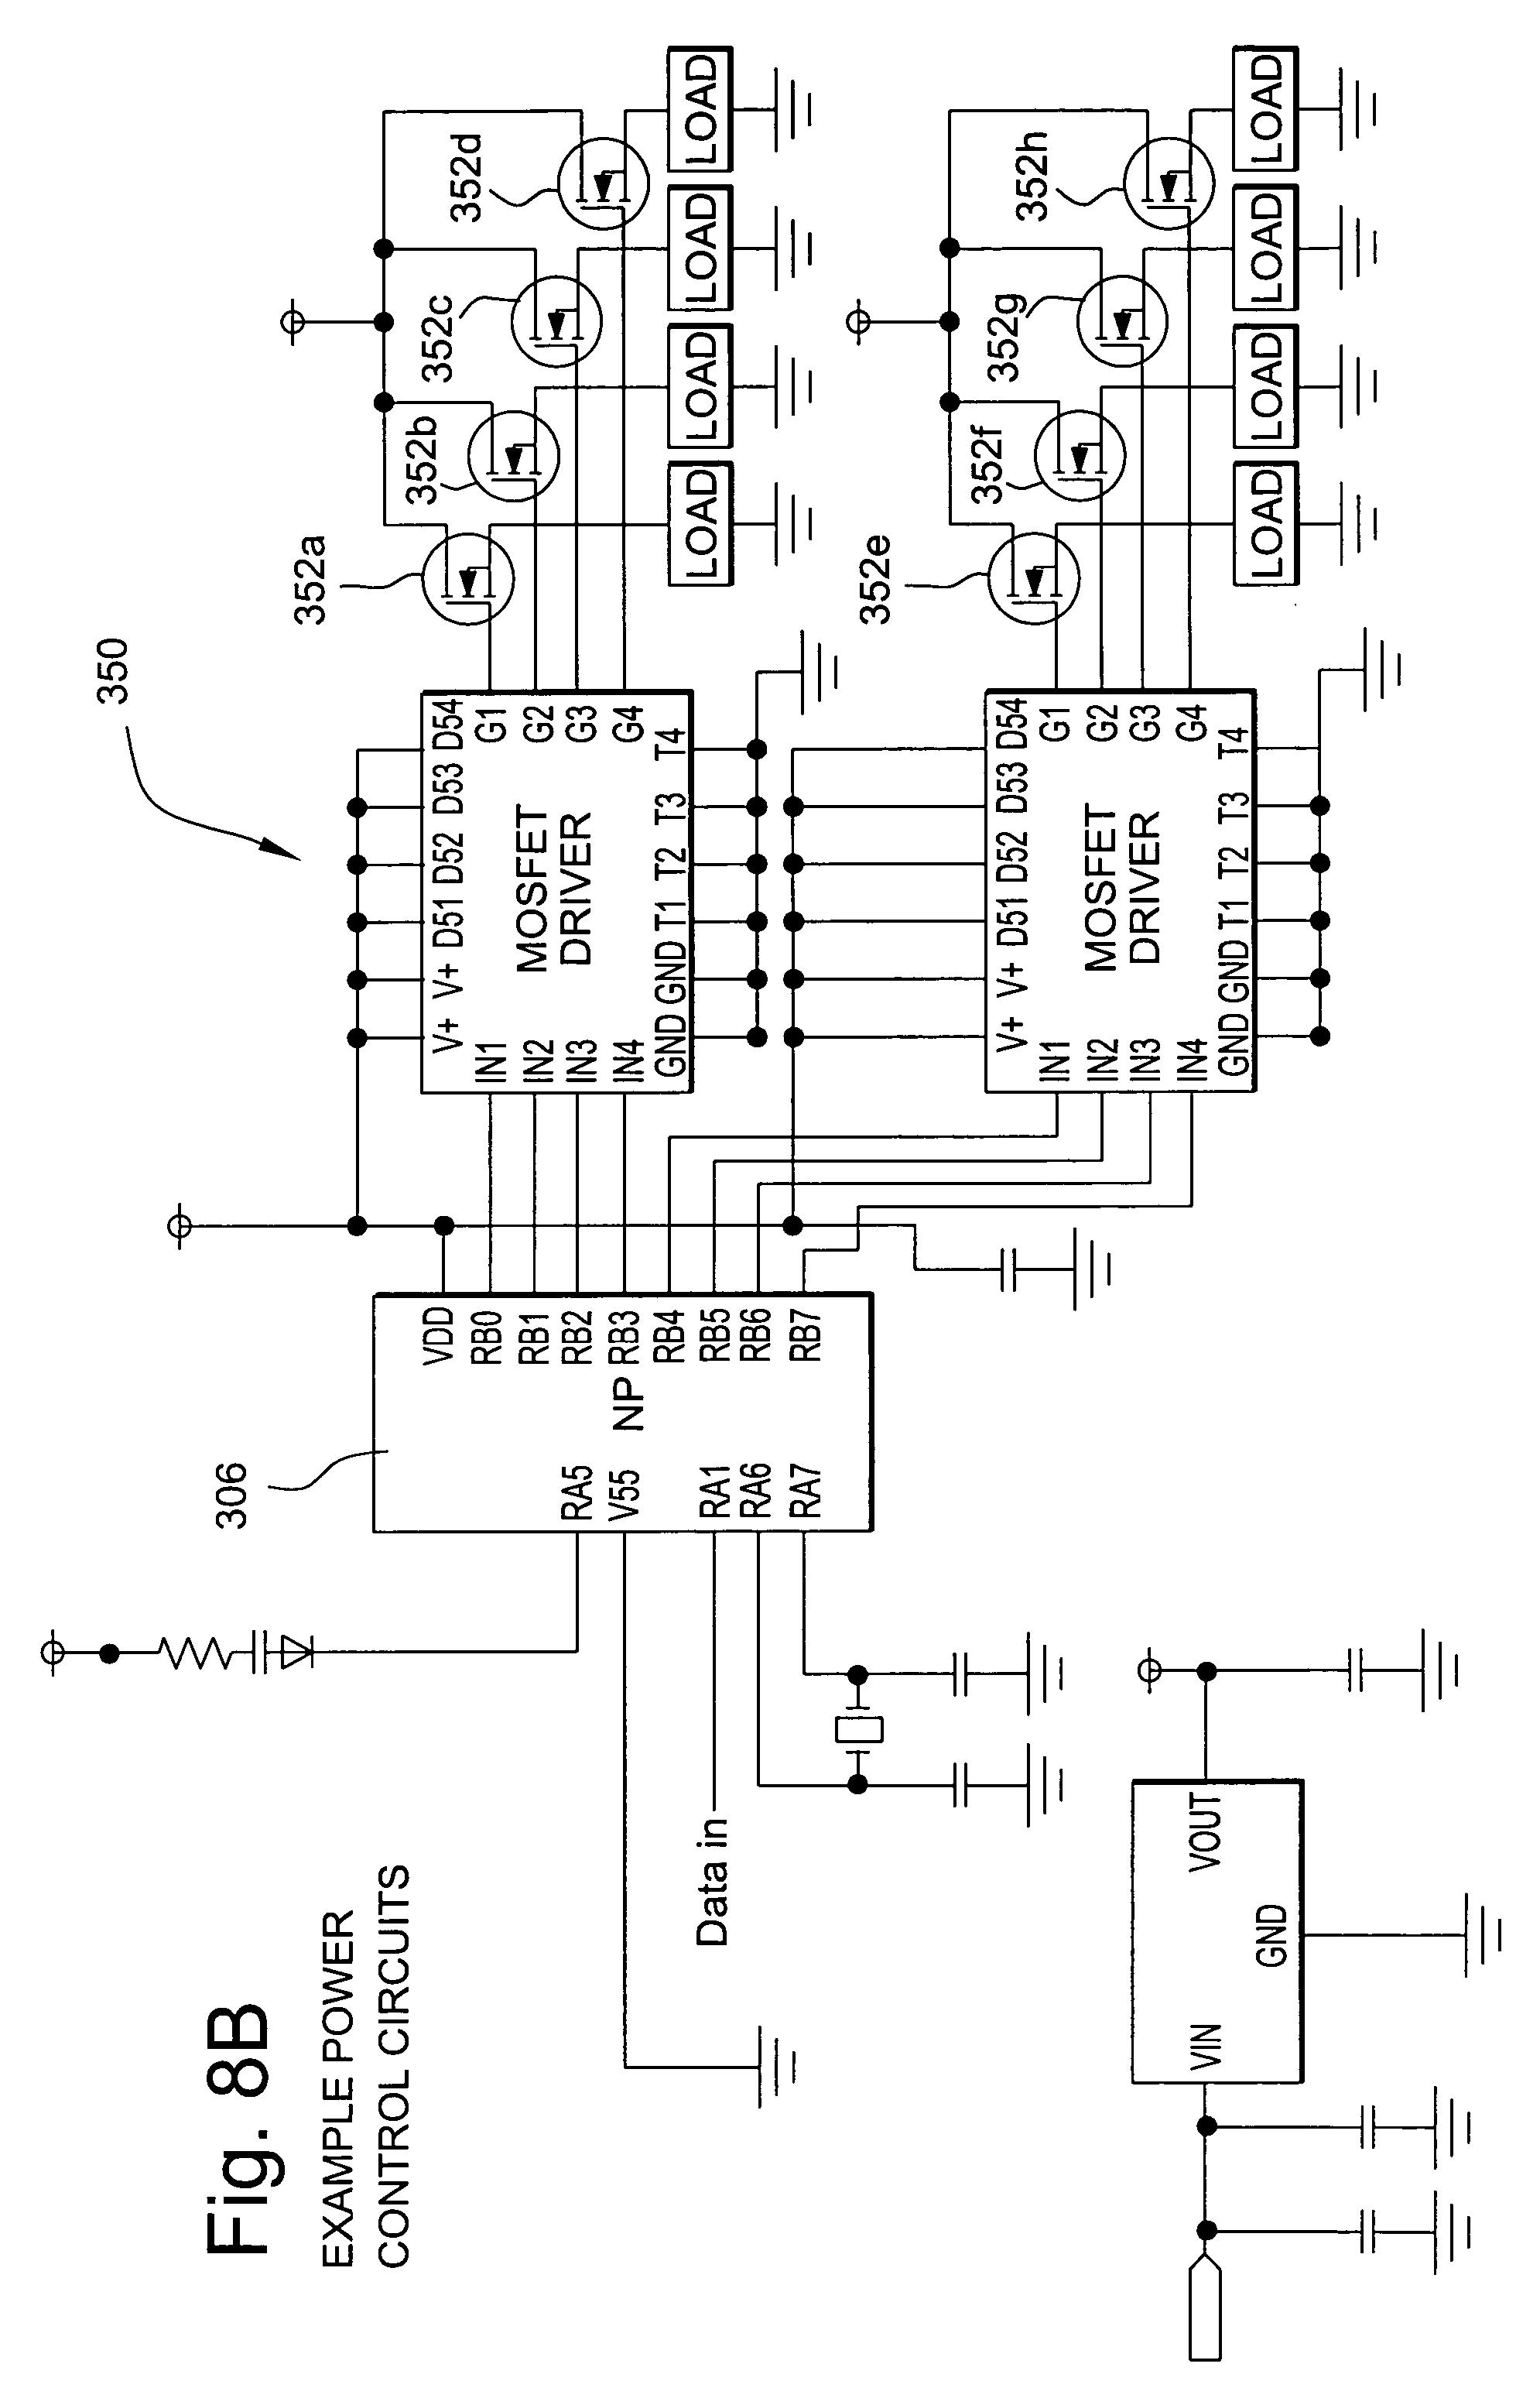 Code 3 Flasher Wiring Diagram - Ford 6 4 Diesel Engine Diagram -  jeepe-jimny.yenpancane.jeanjaures37.frWiring Diagram Resource